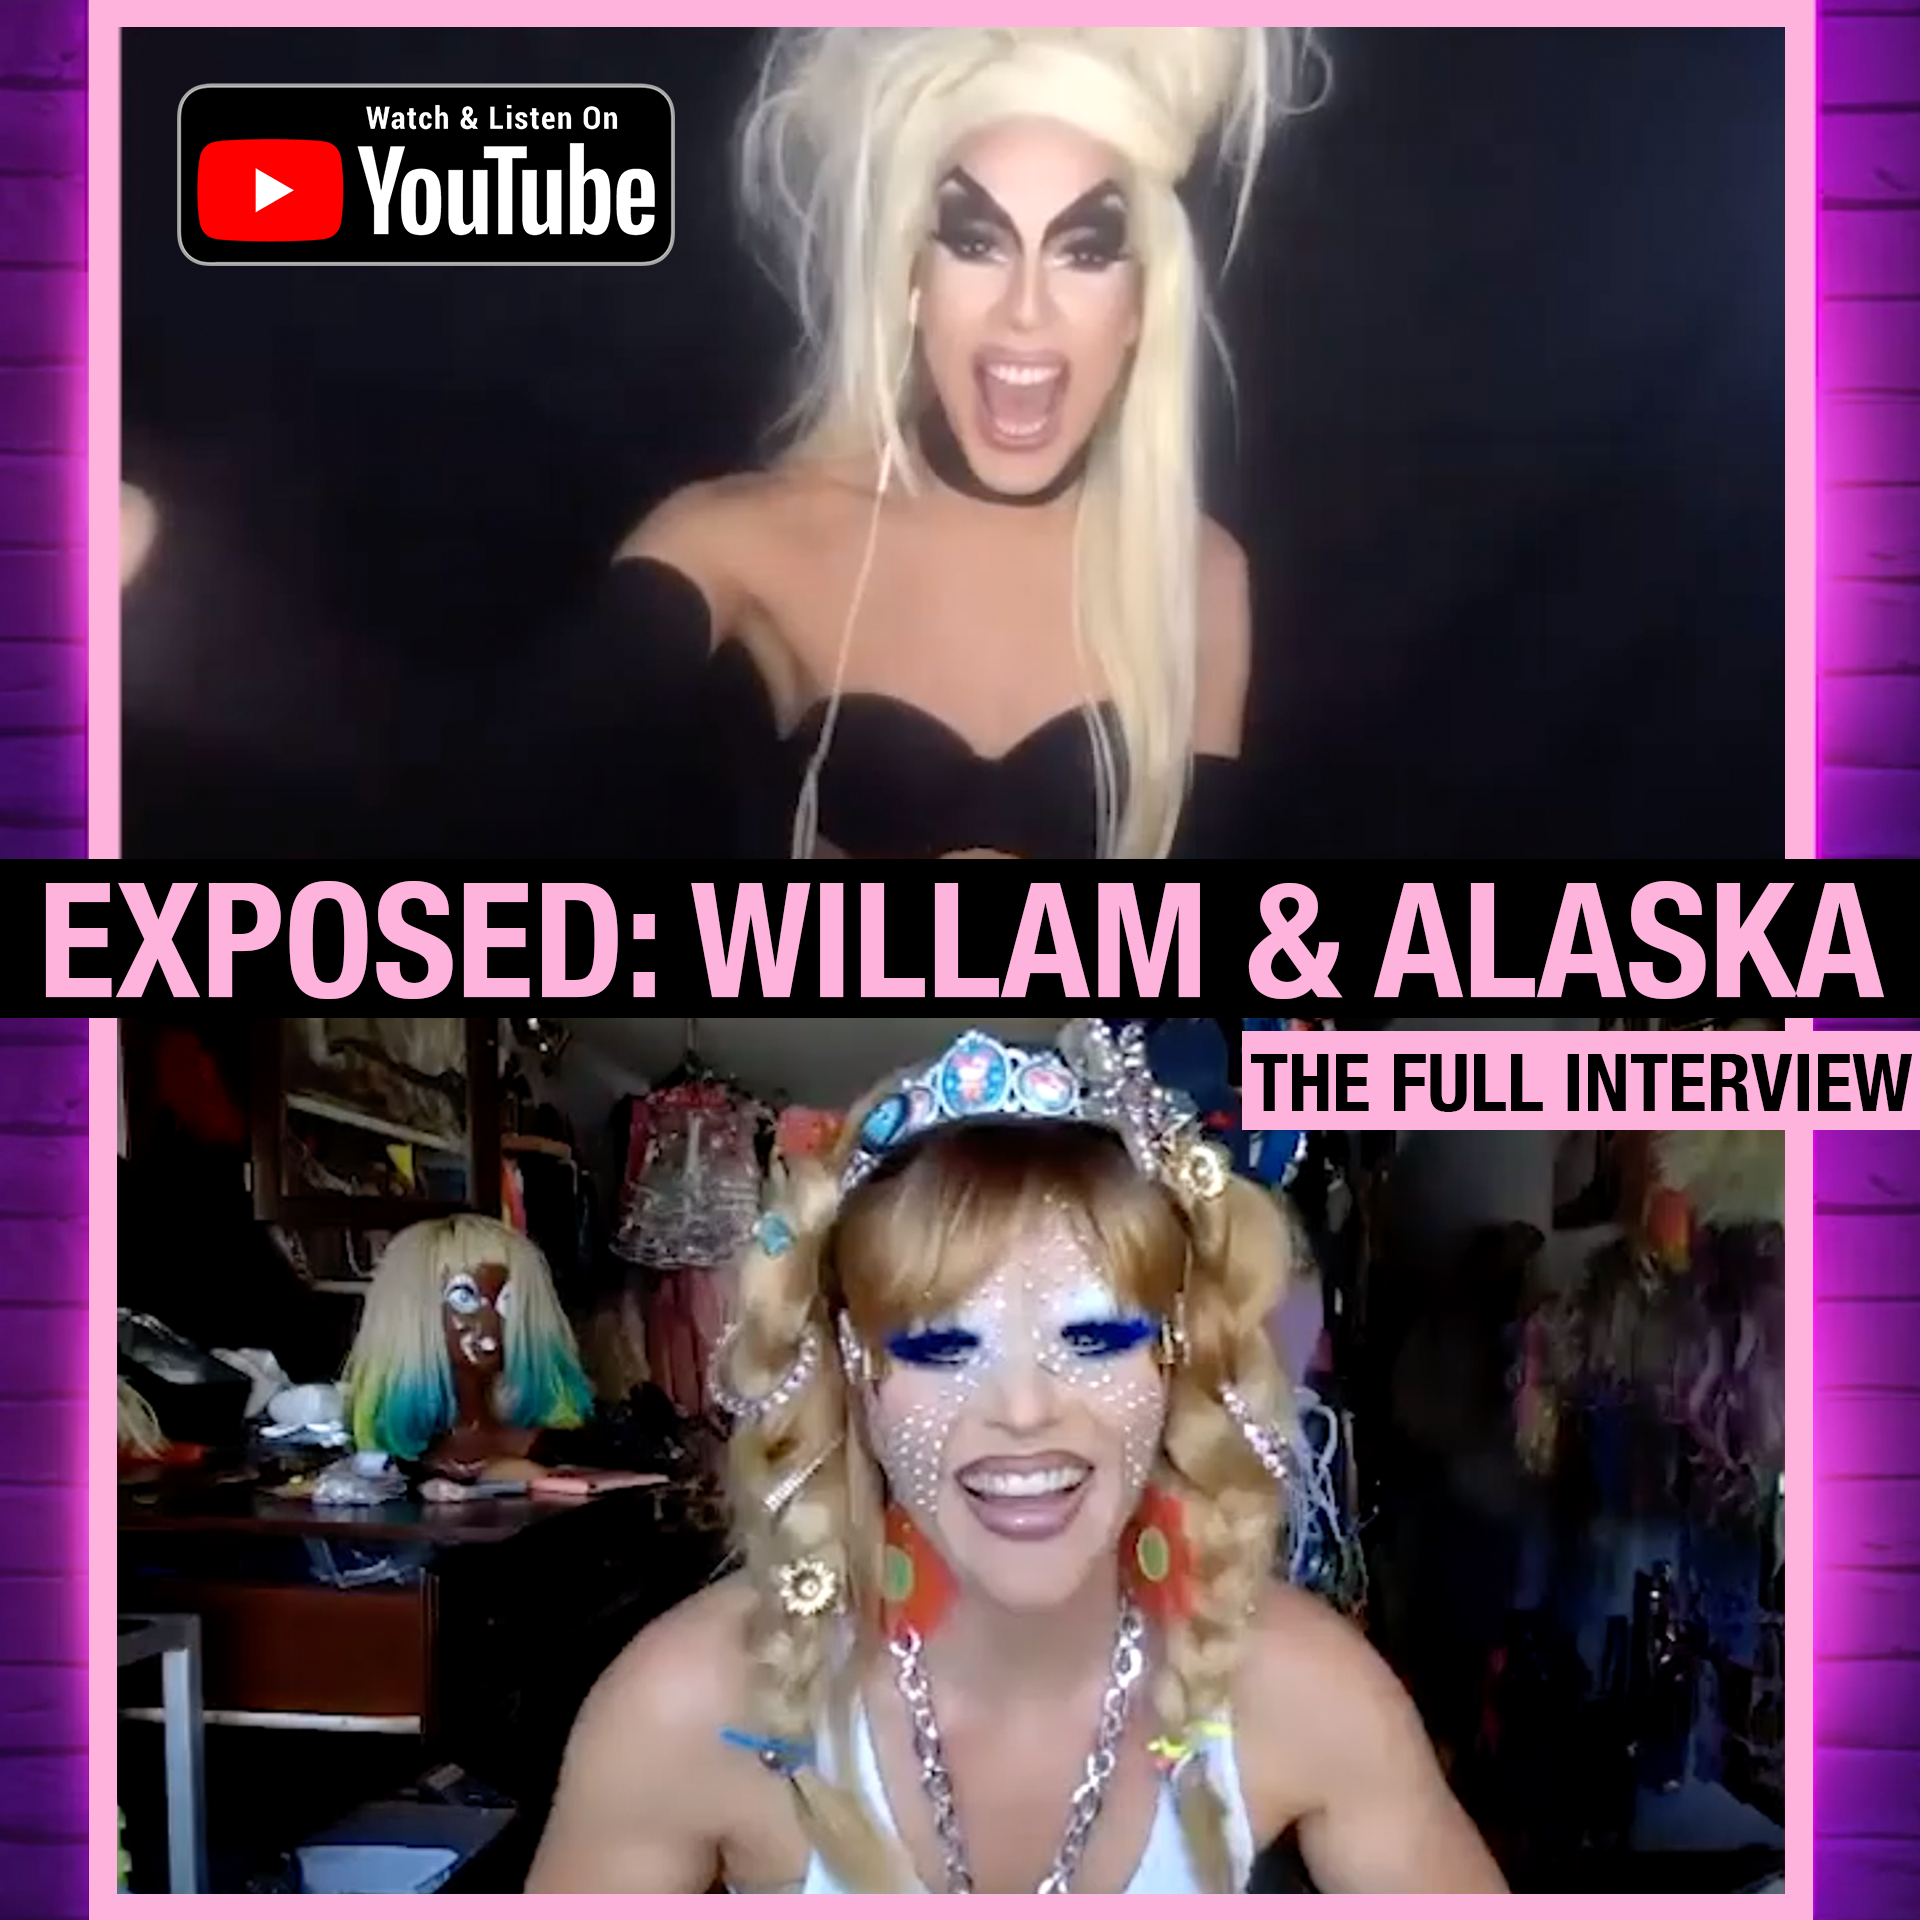 S2E2 - Exposed: Willam & Alaska (Special Pride Interview)